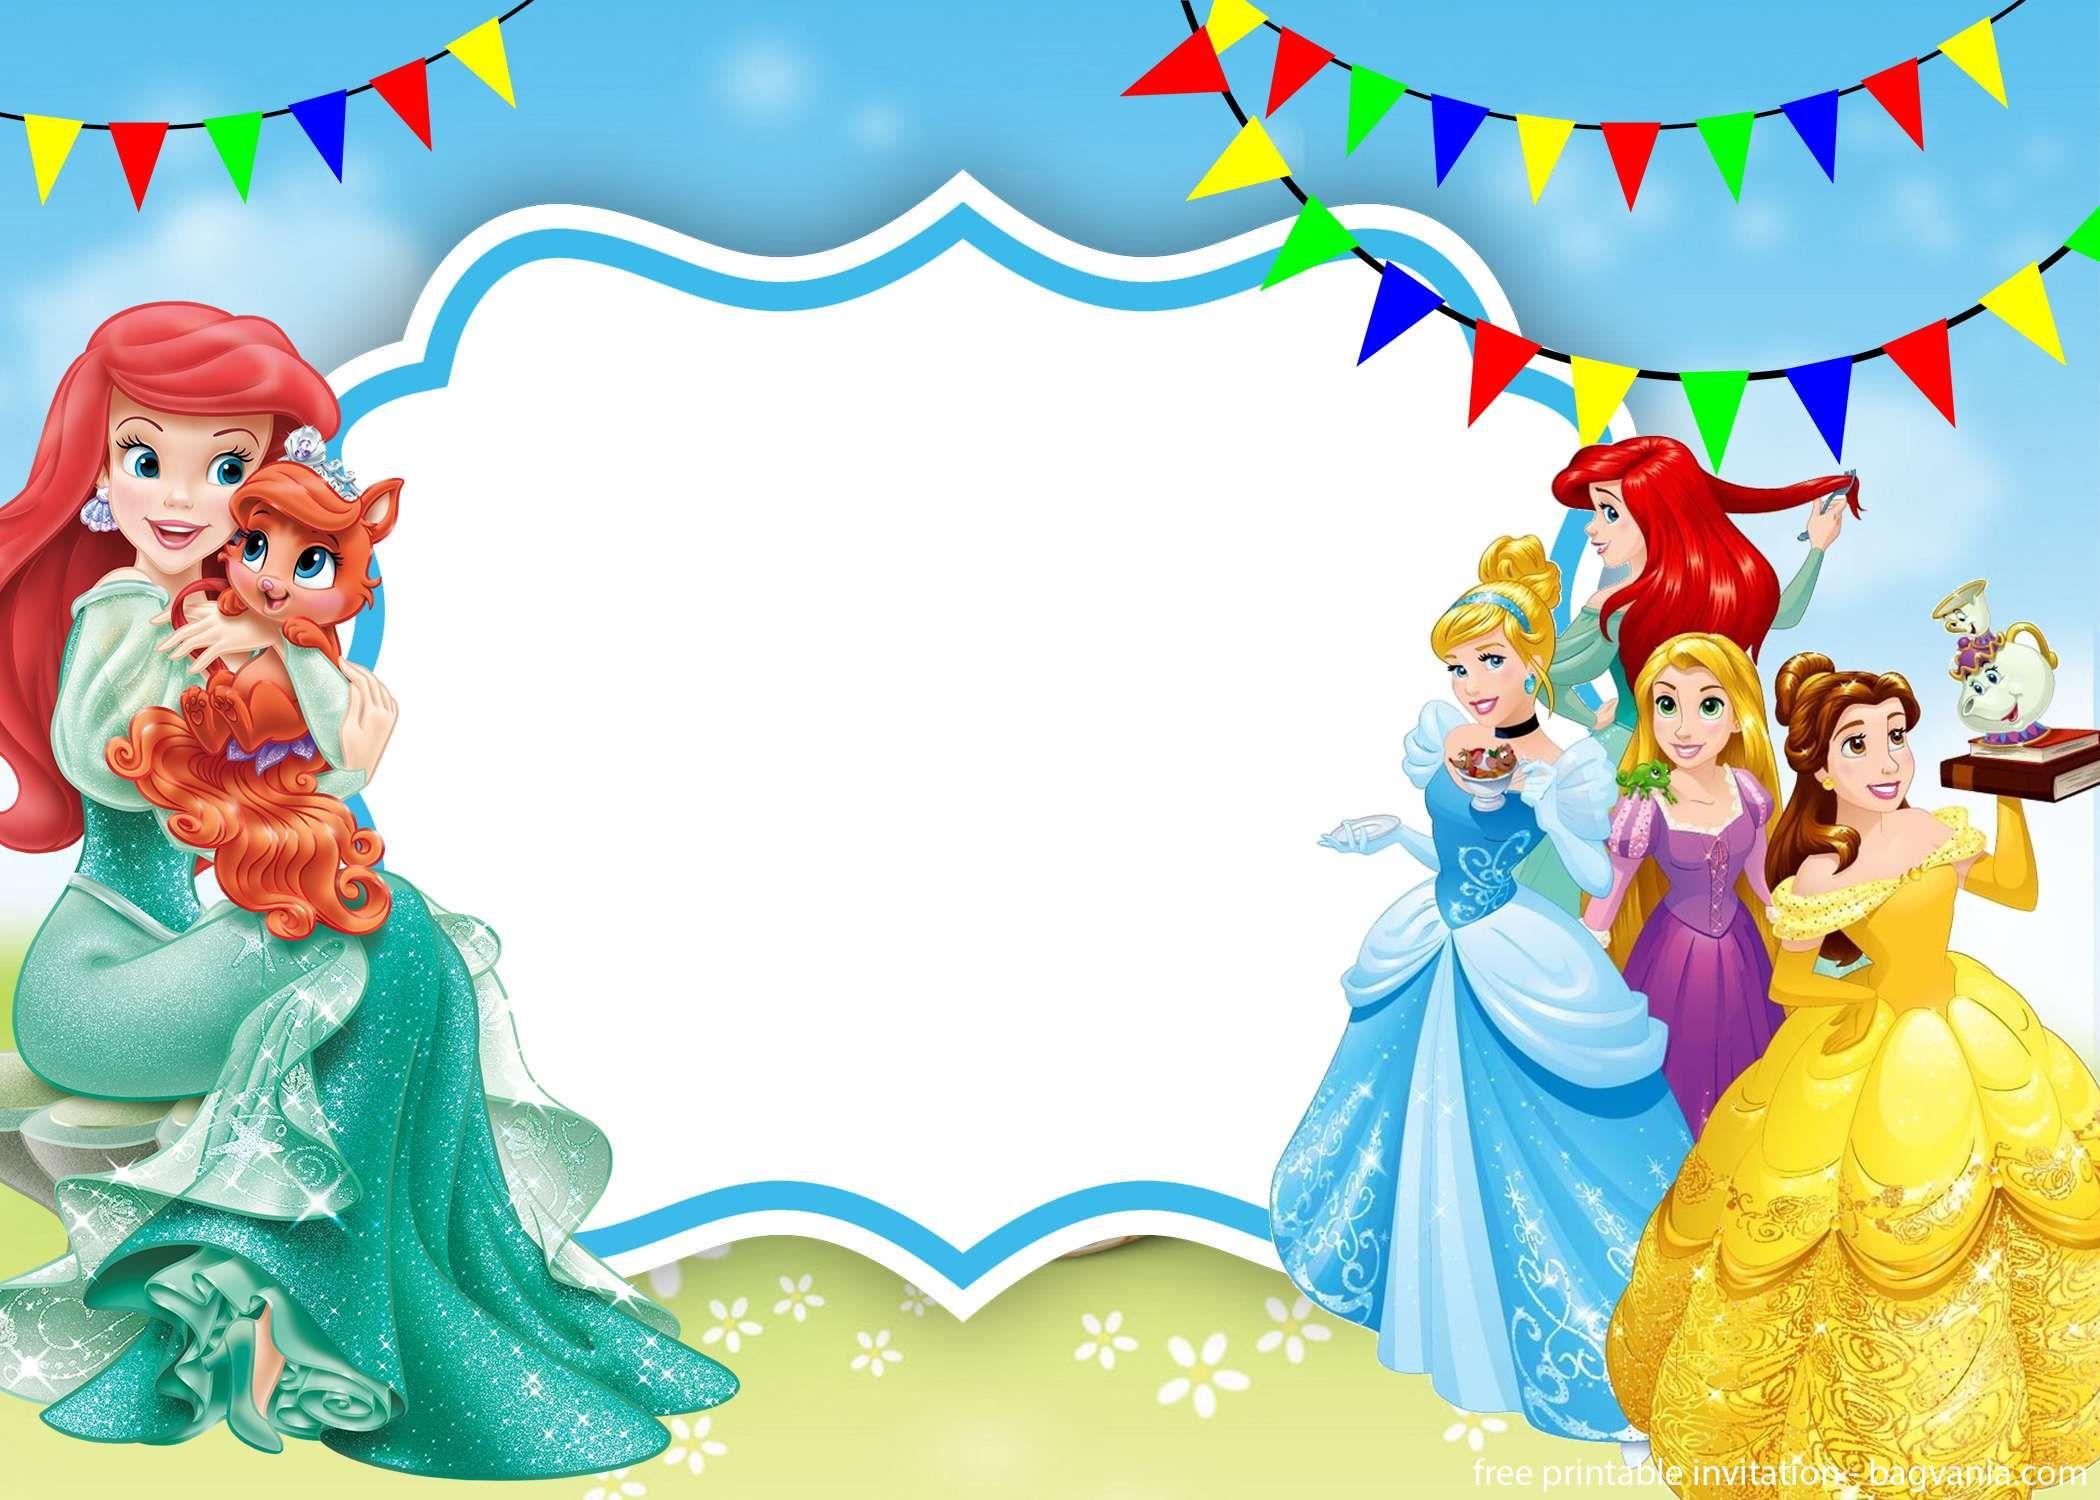 Free Printable Disney Princessess Invitation Template Disney Princess Invitations Disney Invitations Princess Invitations